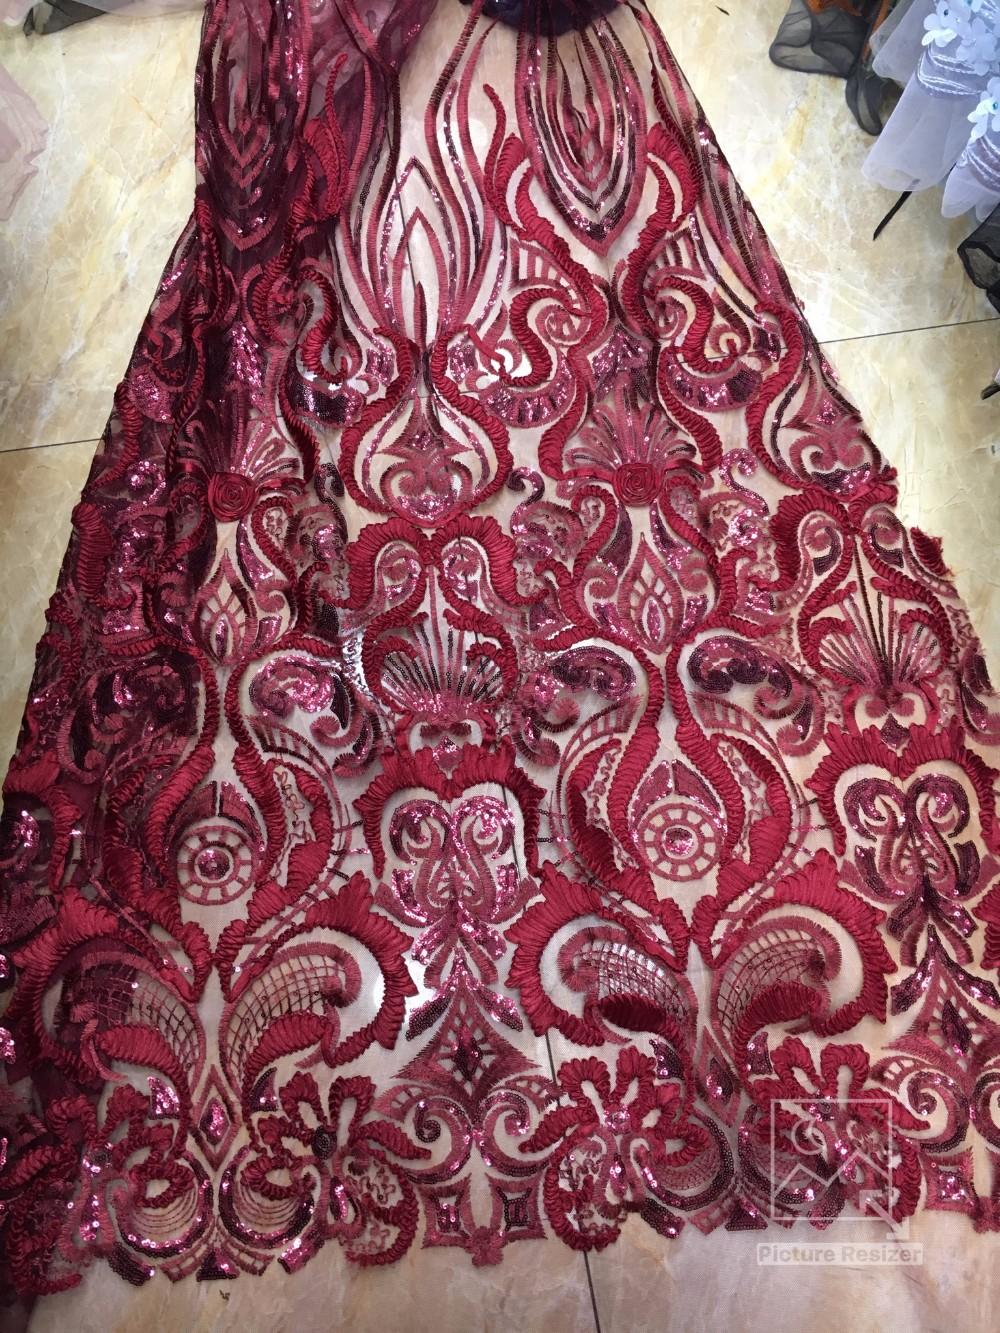 ᓂafrican lace fabric puntillas bordadas encaje anchas african lace ...